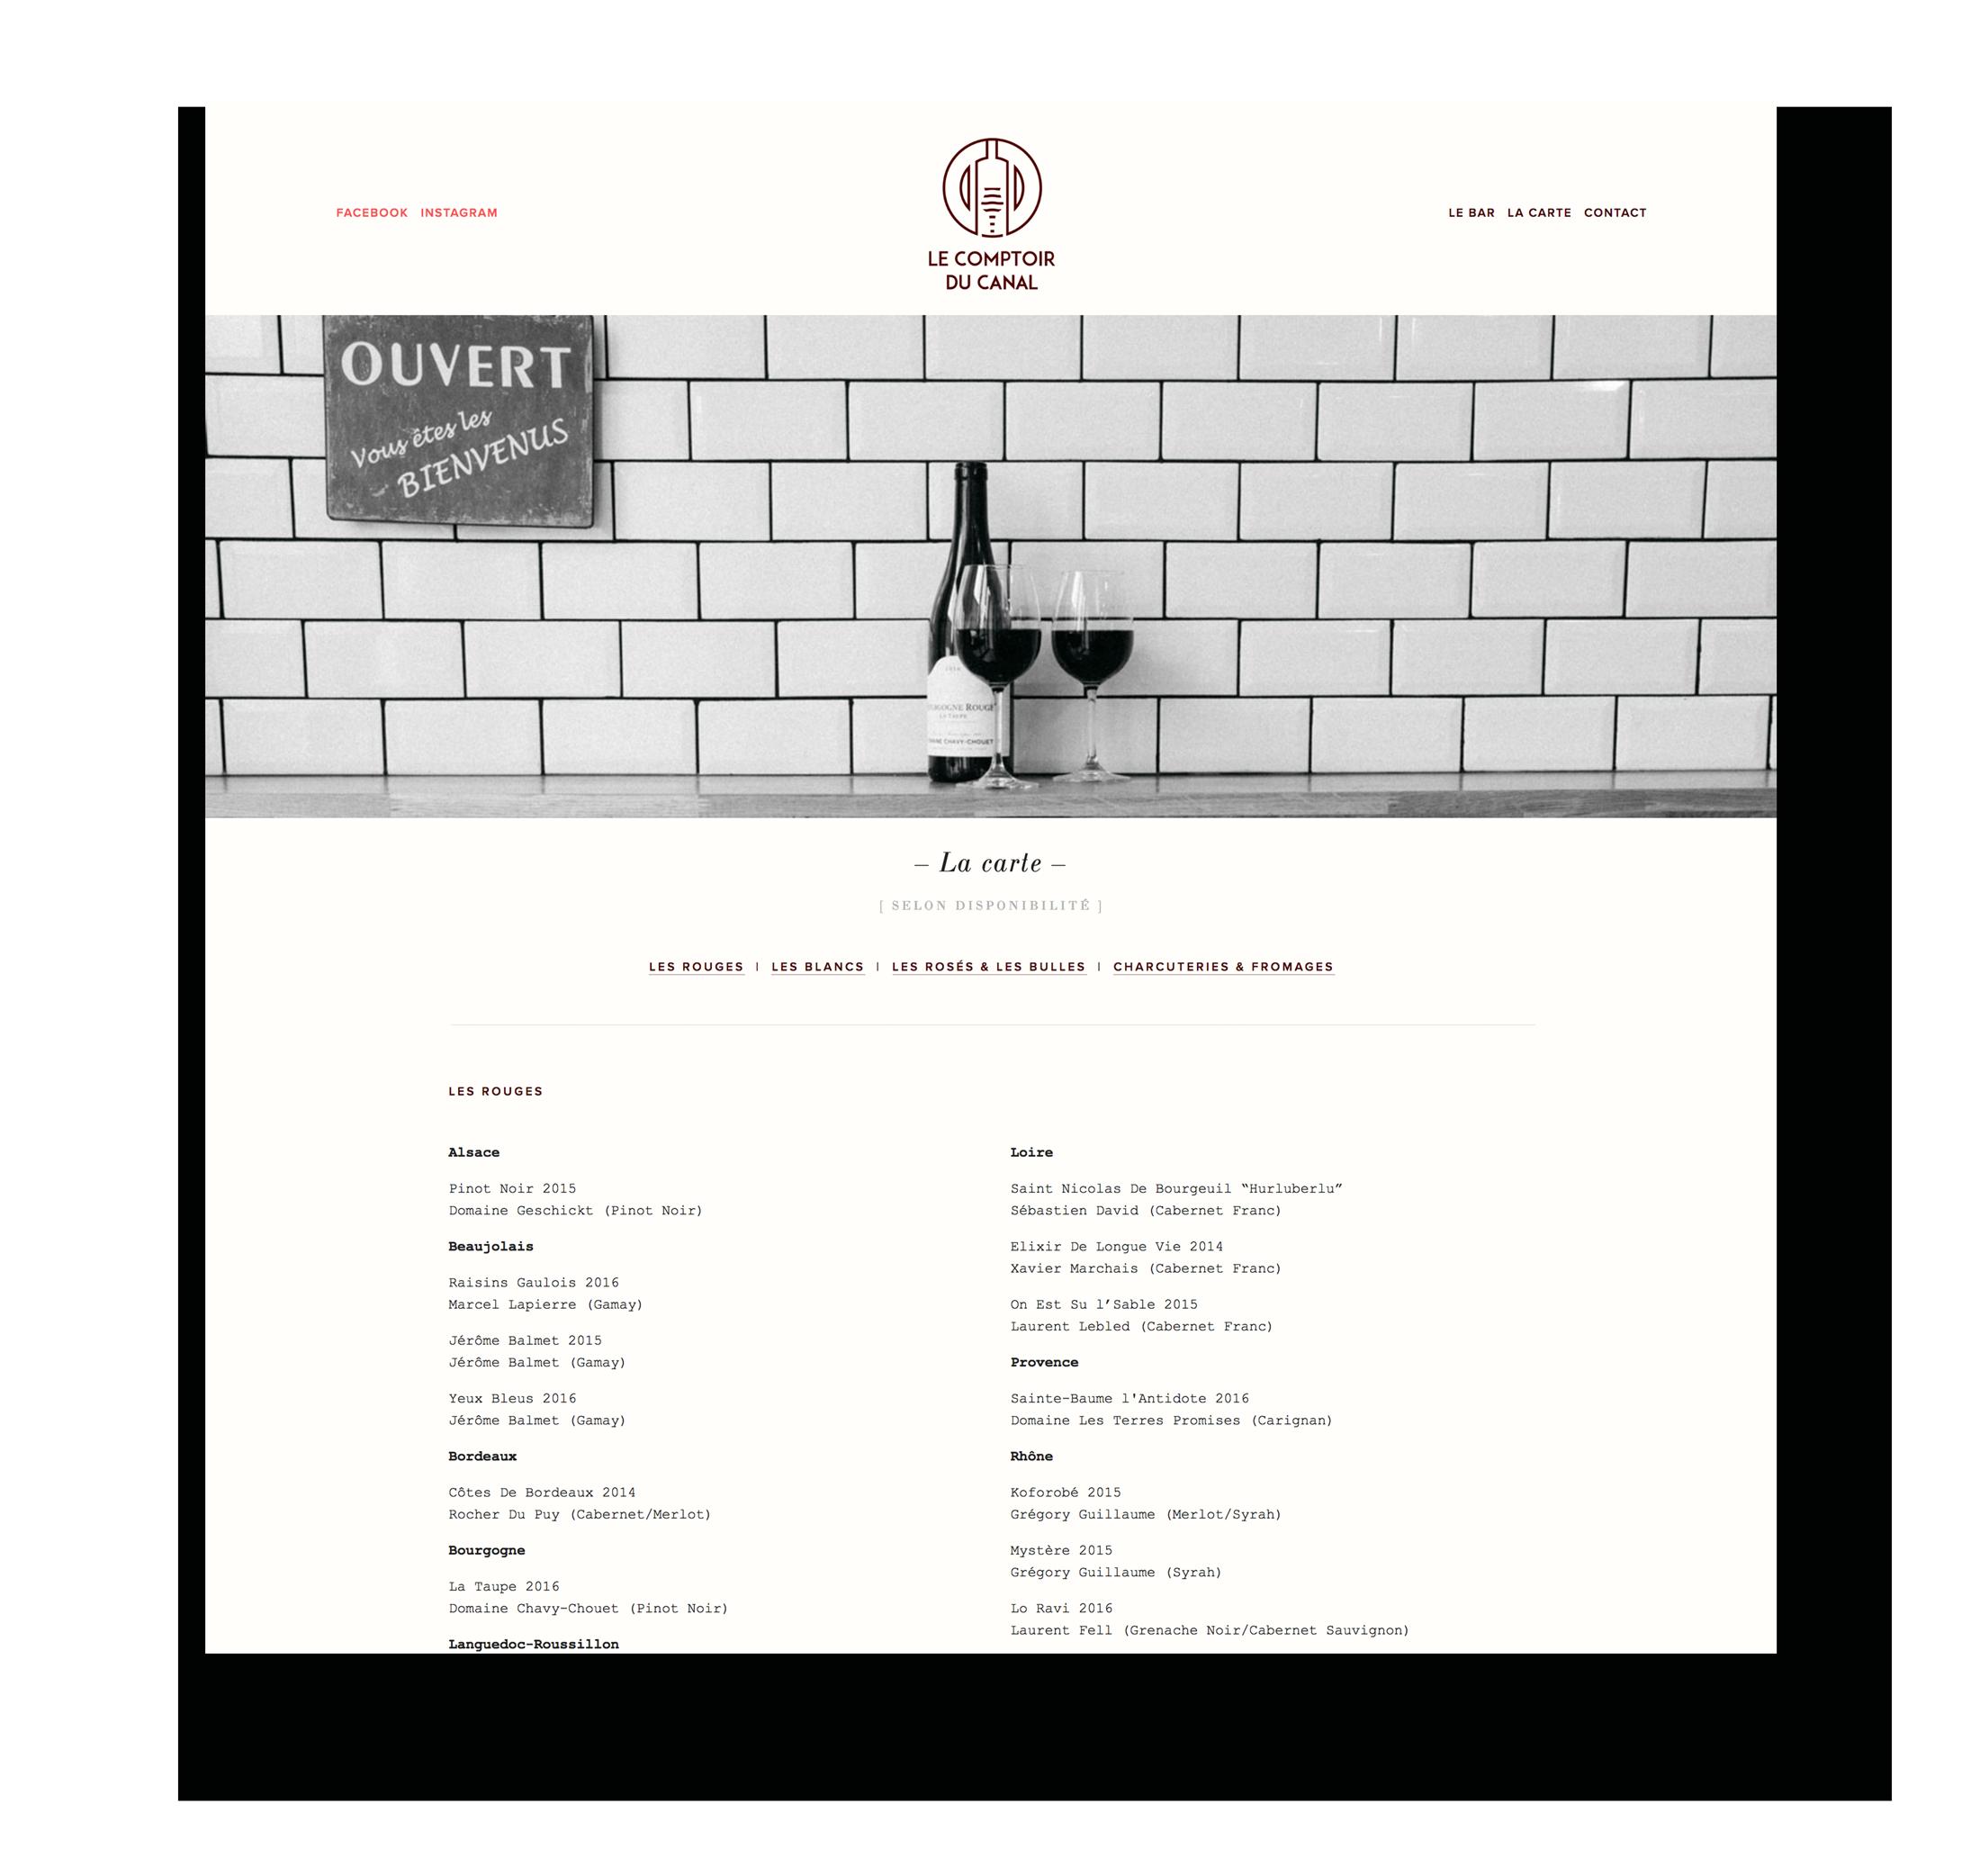 The_Ink_Collective_Creative_Content_Design_Editorial_Agency_Paris_Sydney_Brand_Identity_Web_Design_Photography_Paris_Bar_Le_Comptoir_du_Canal_Cover_Banner.png